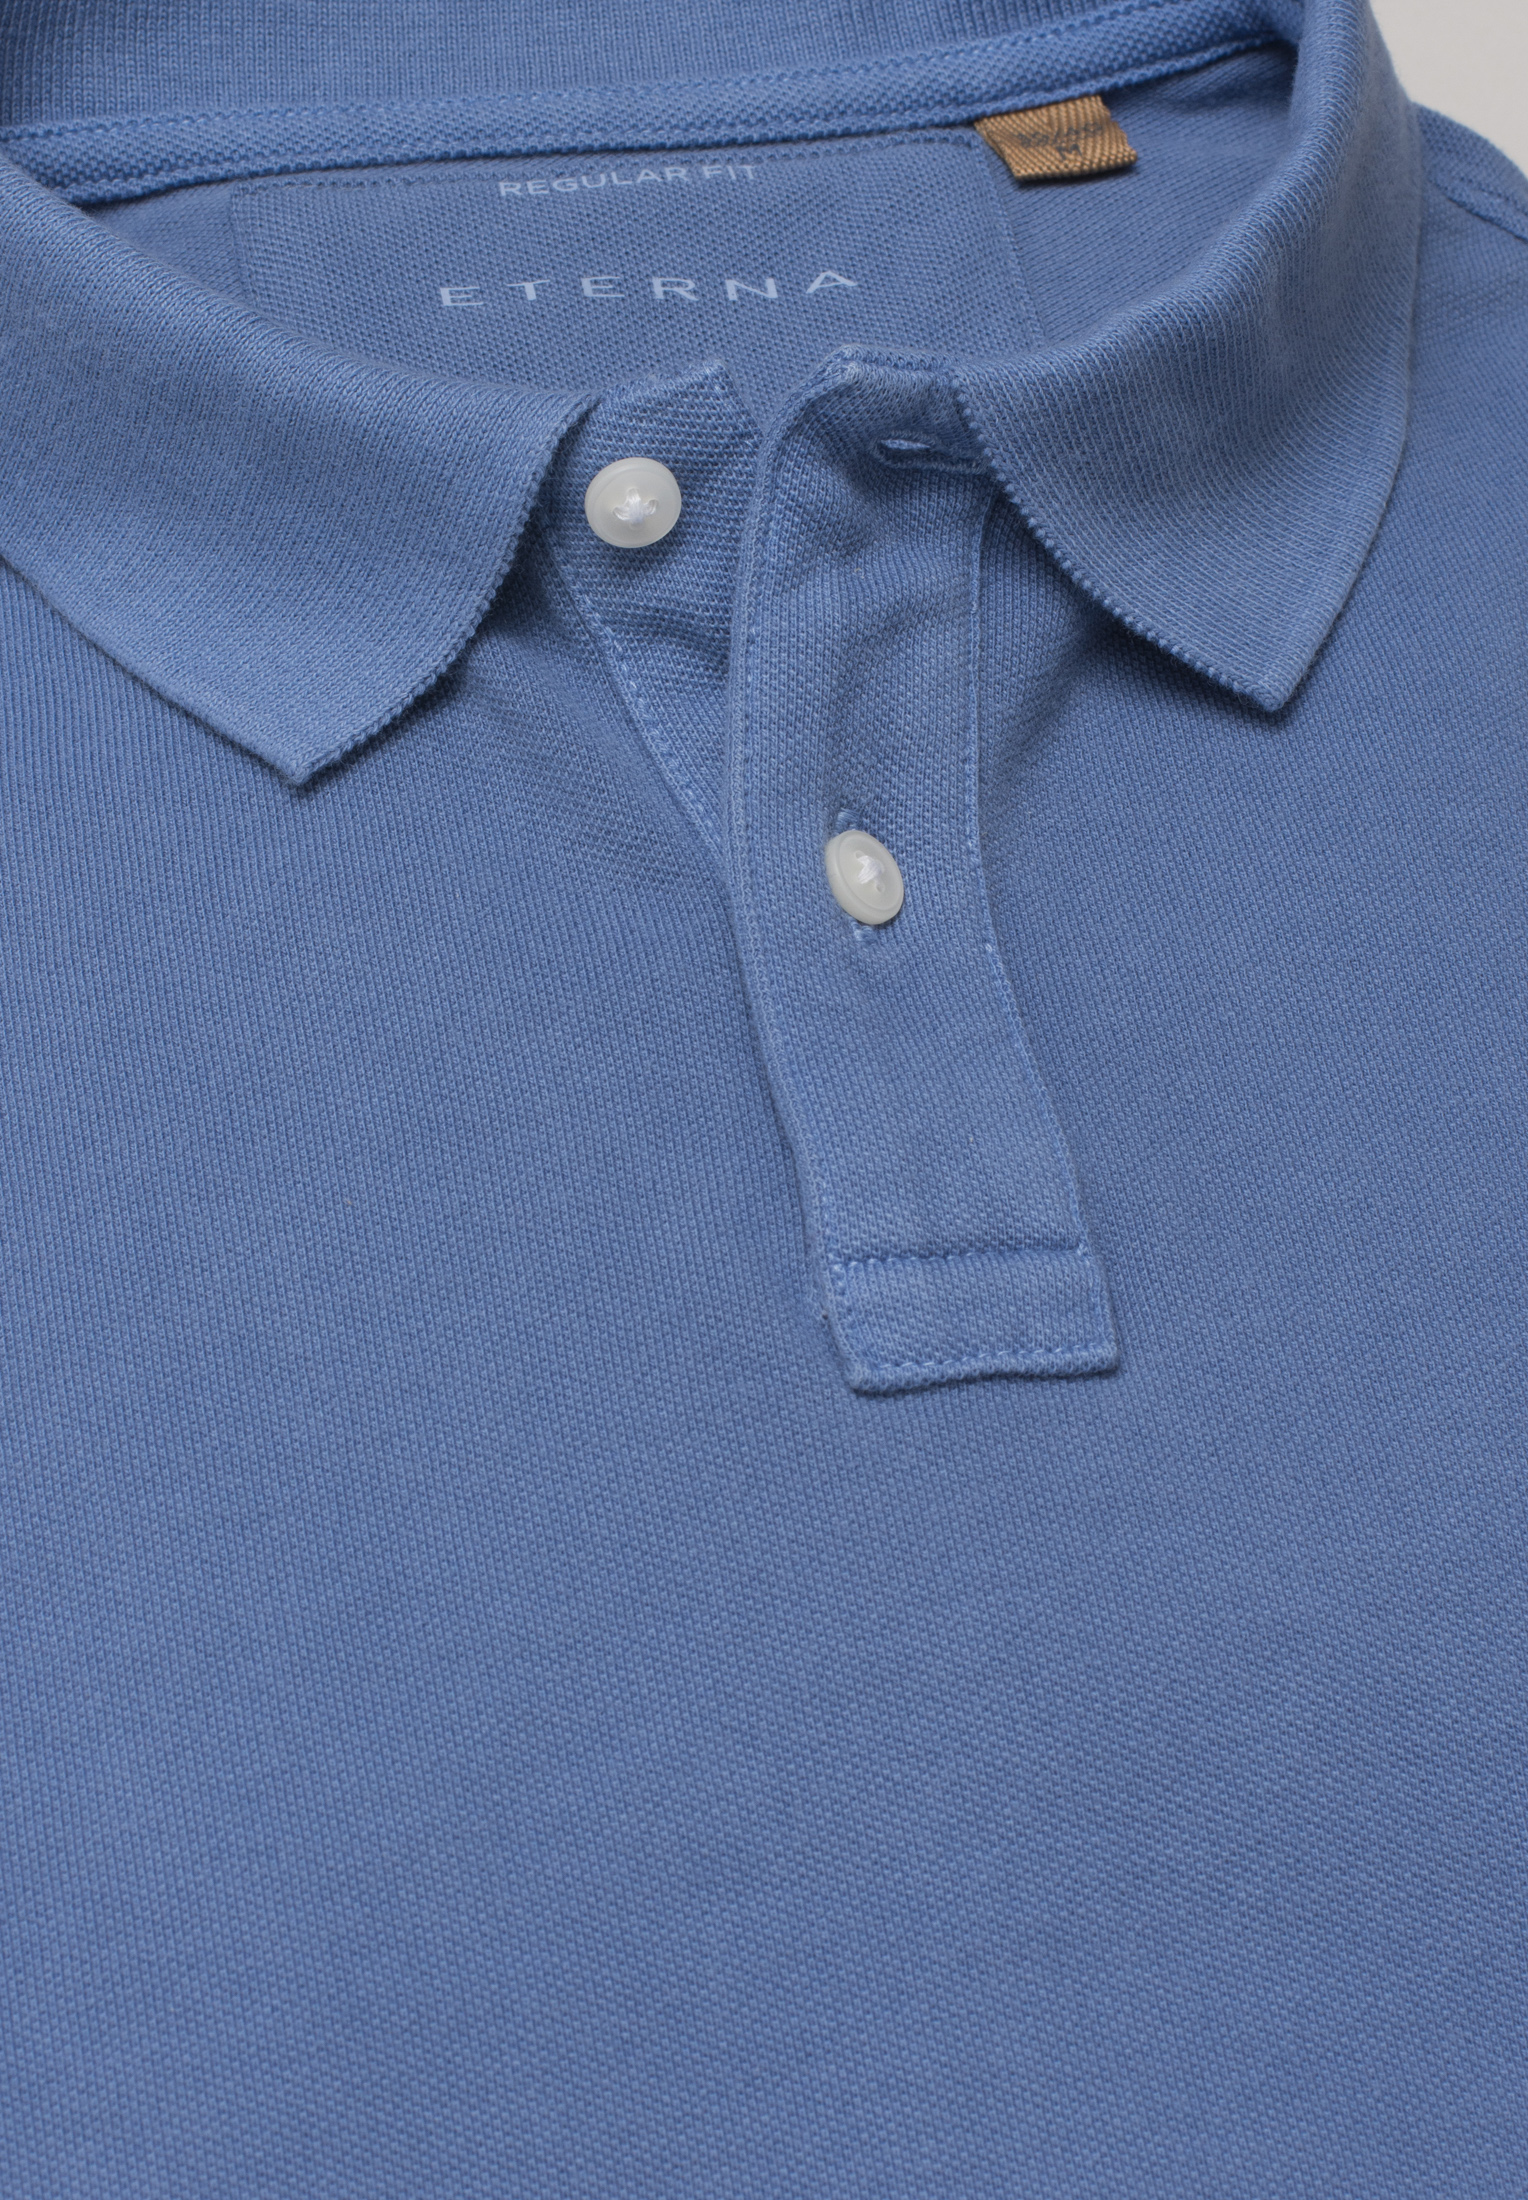 ETERNA 2223 Poloshirt Baumwolle rauchblau